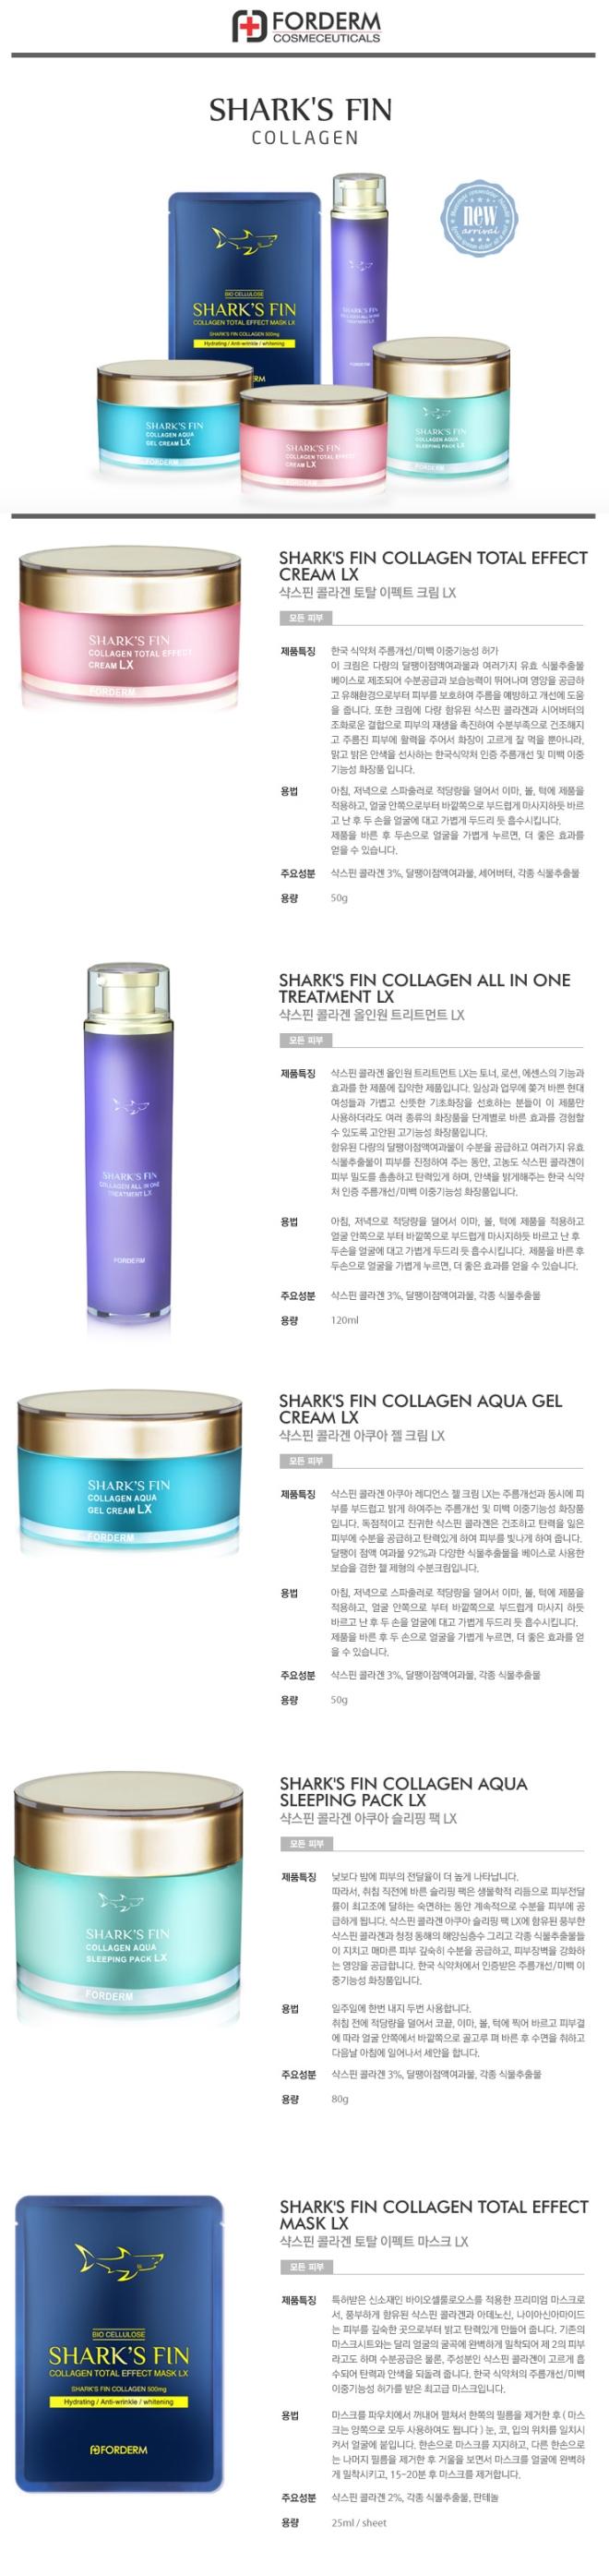 Credit: Forderm Cosmeceuticals Korea website